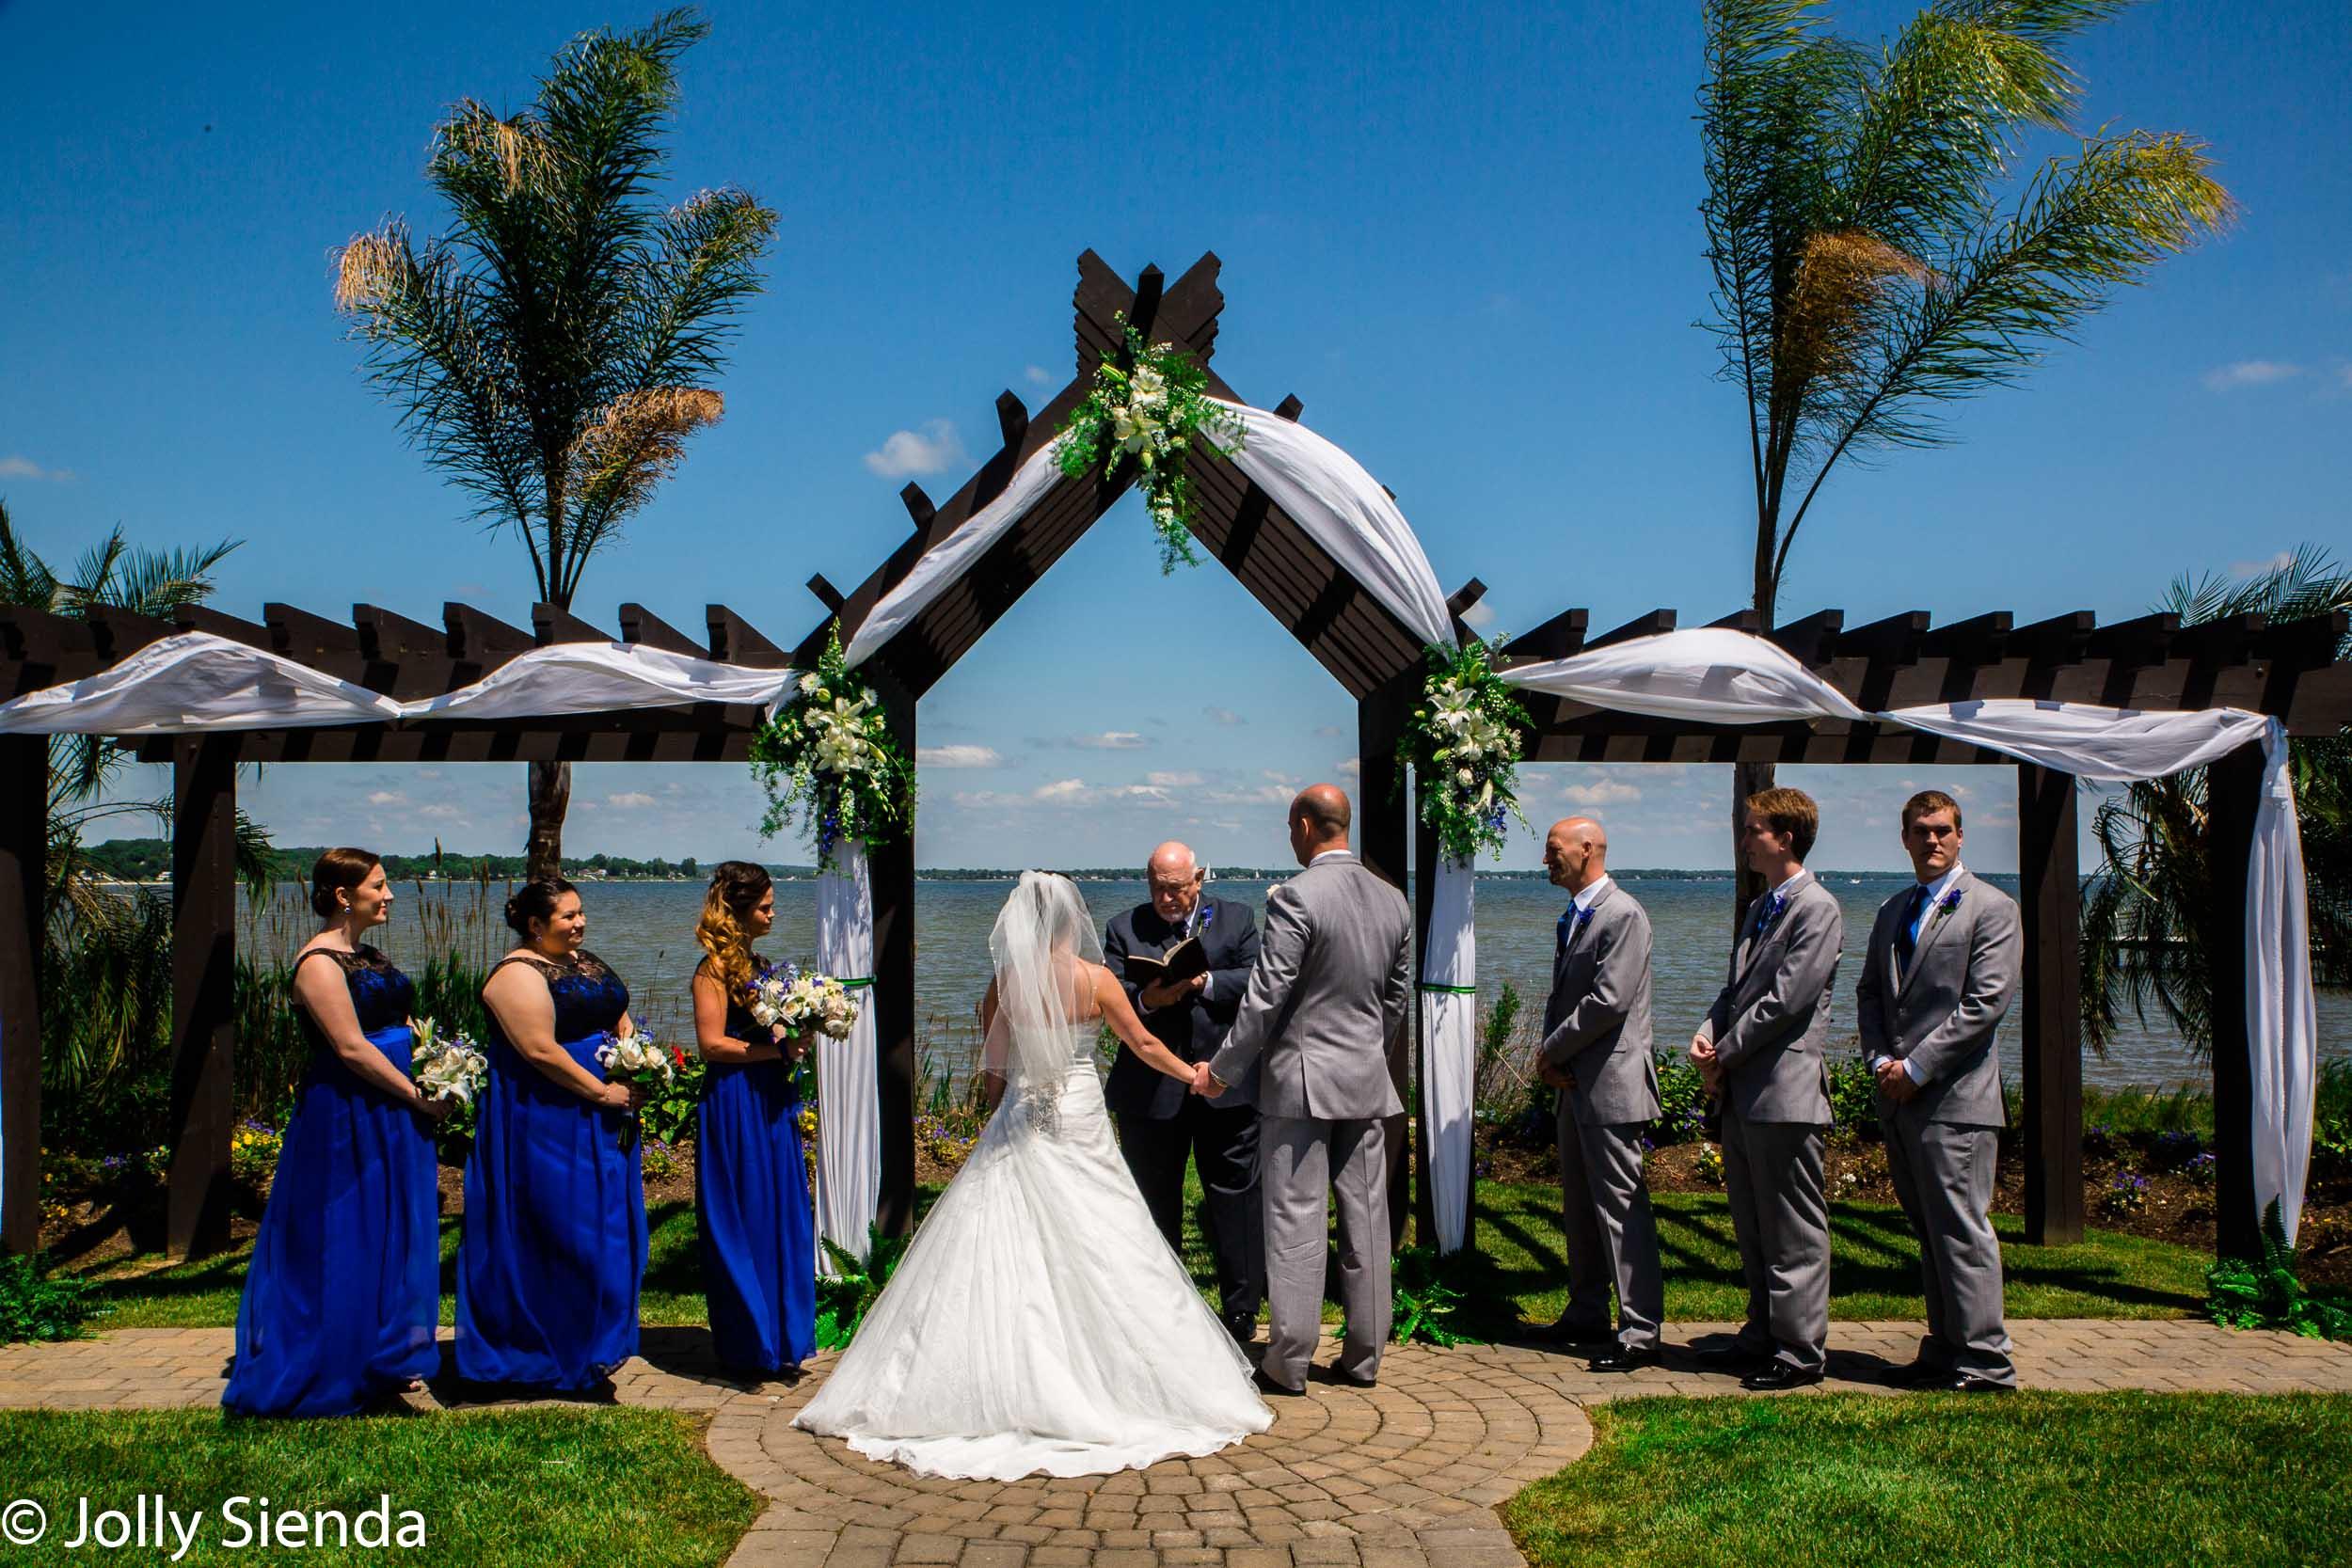 Wedding photography for a Hawaiian style wedding